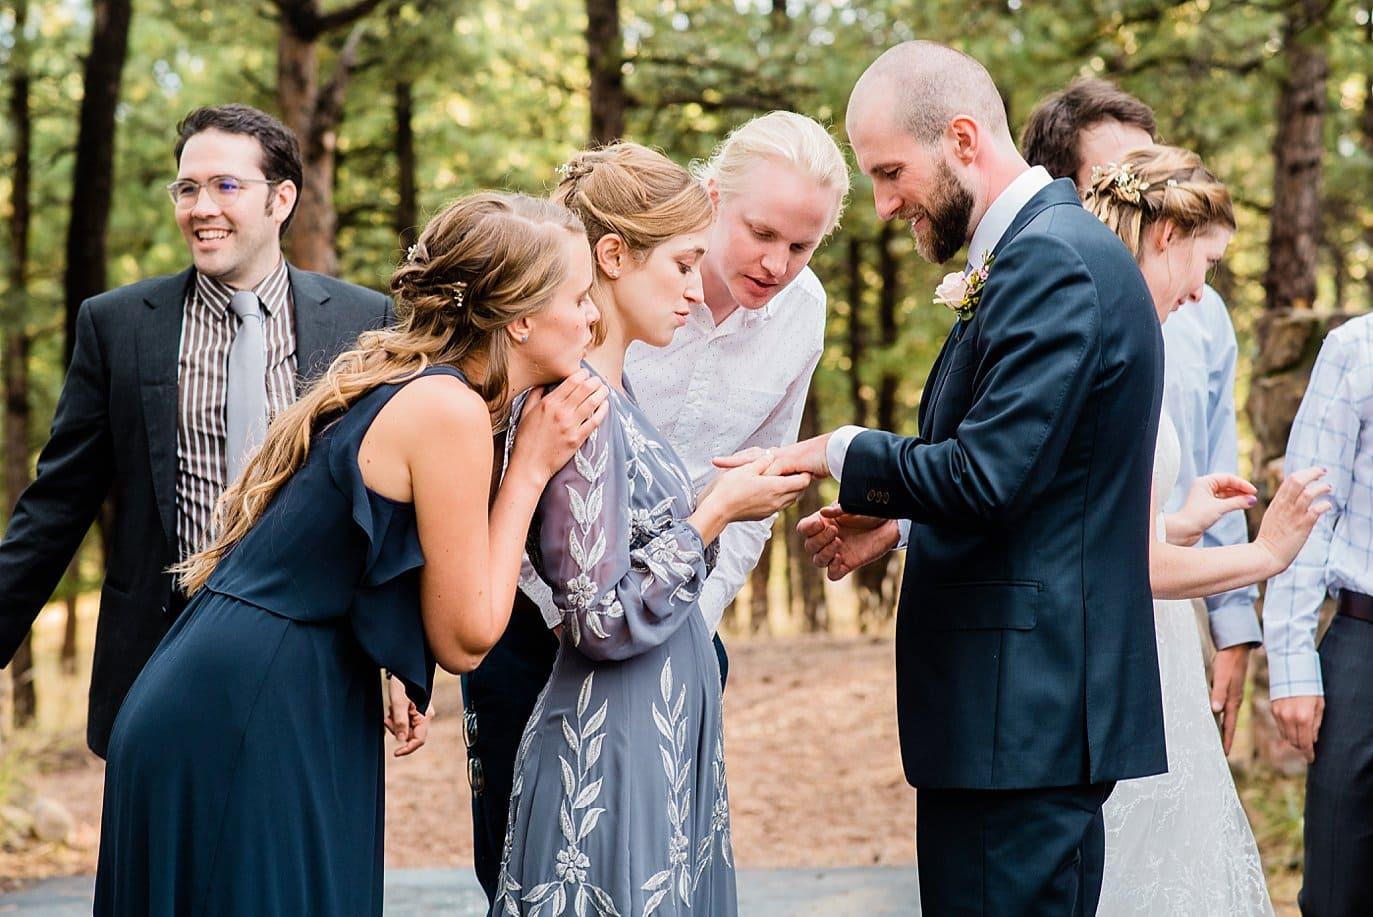 bridesmaids look at grooms wedding ring at Golden wedding